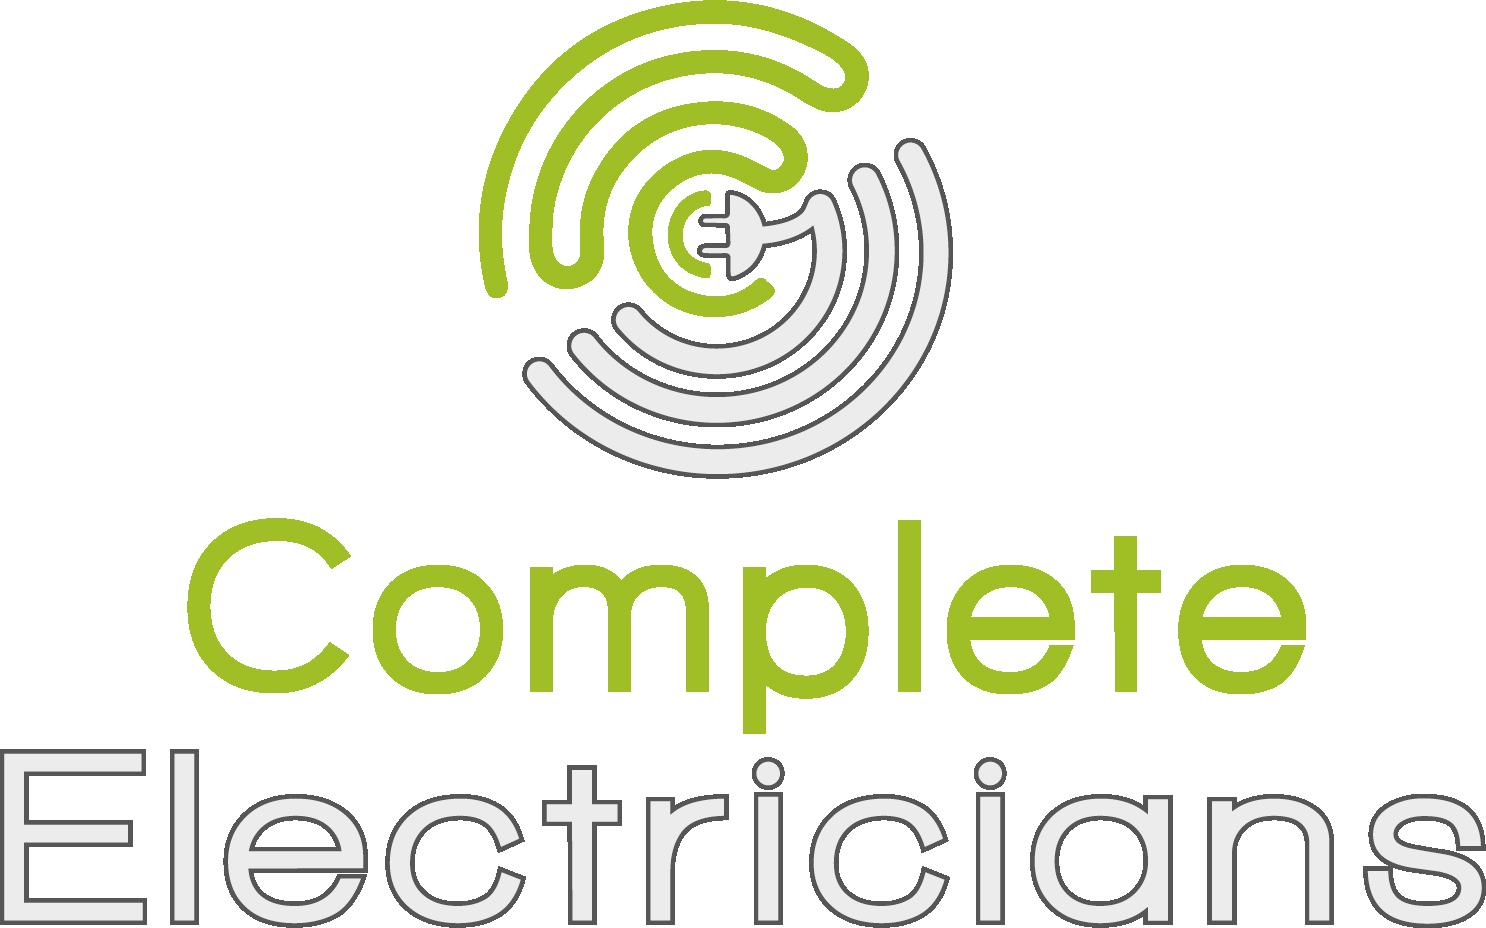 Complete Electricians Logo